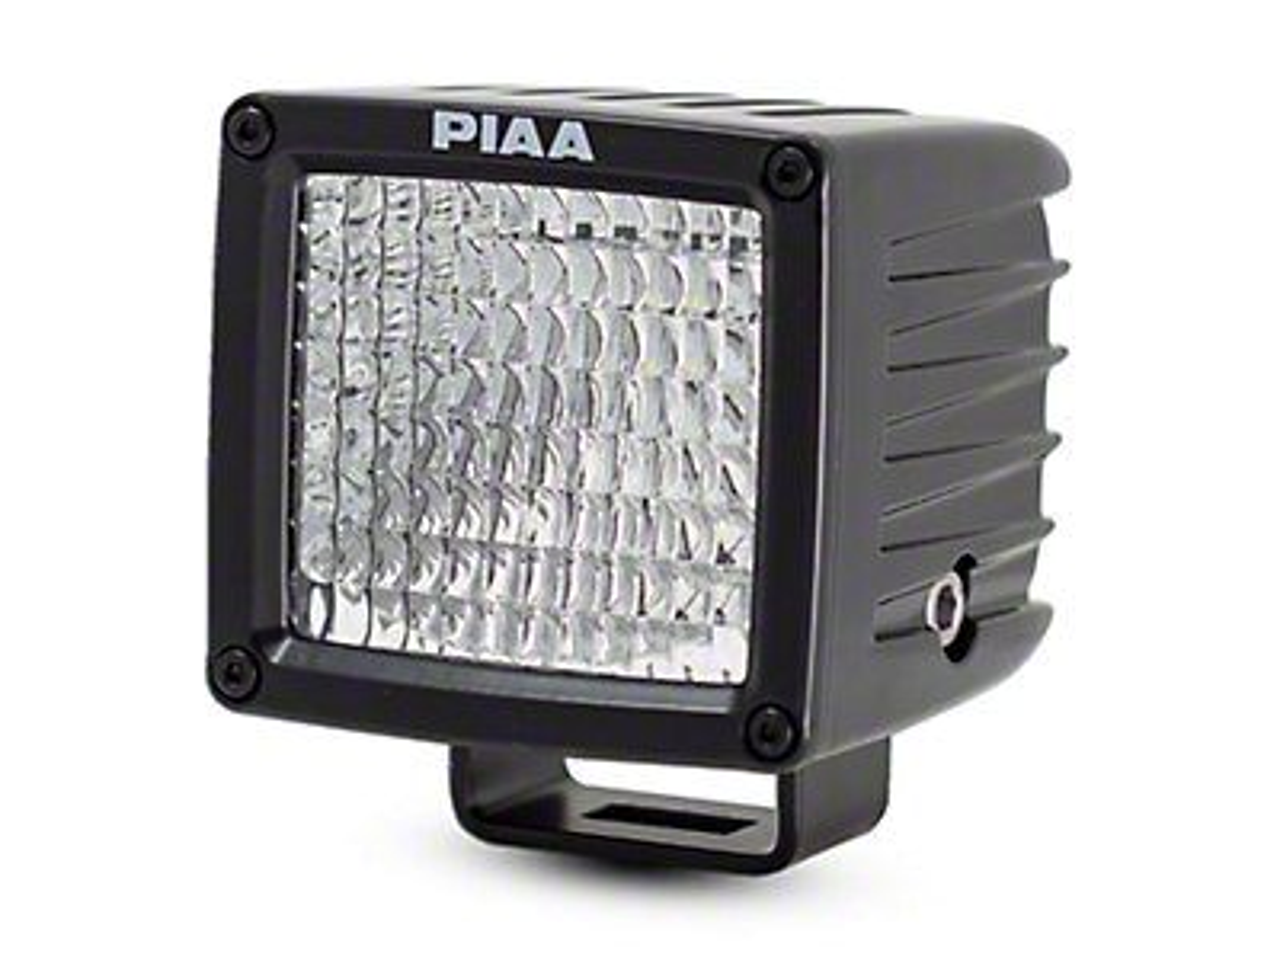 PIAA 3 in. RF Series LED Cube Light - Flood Beam